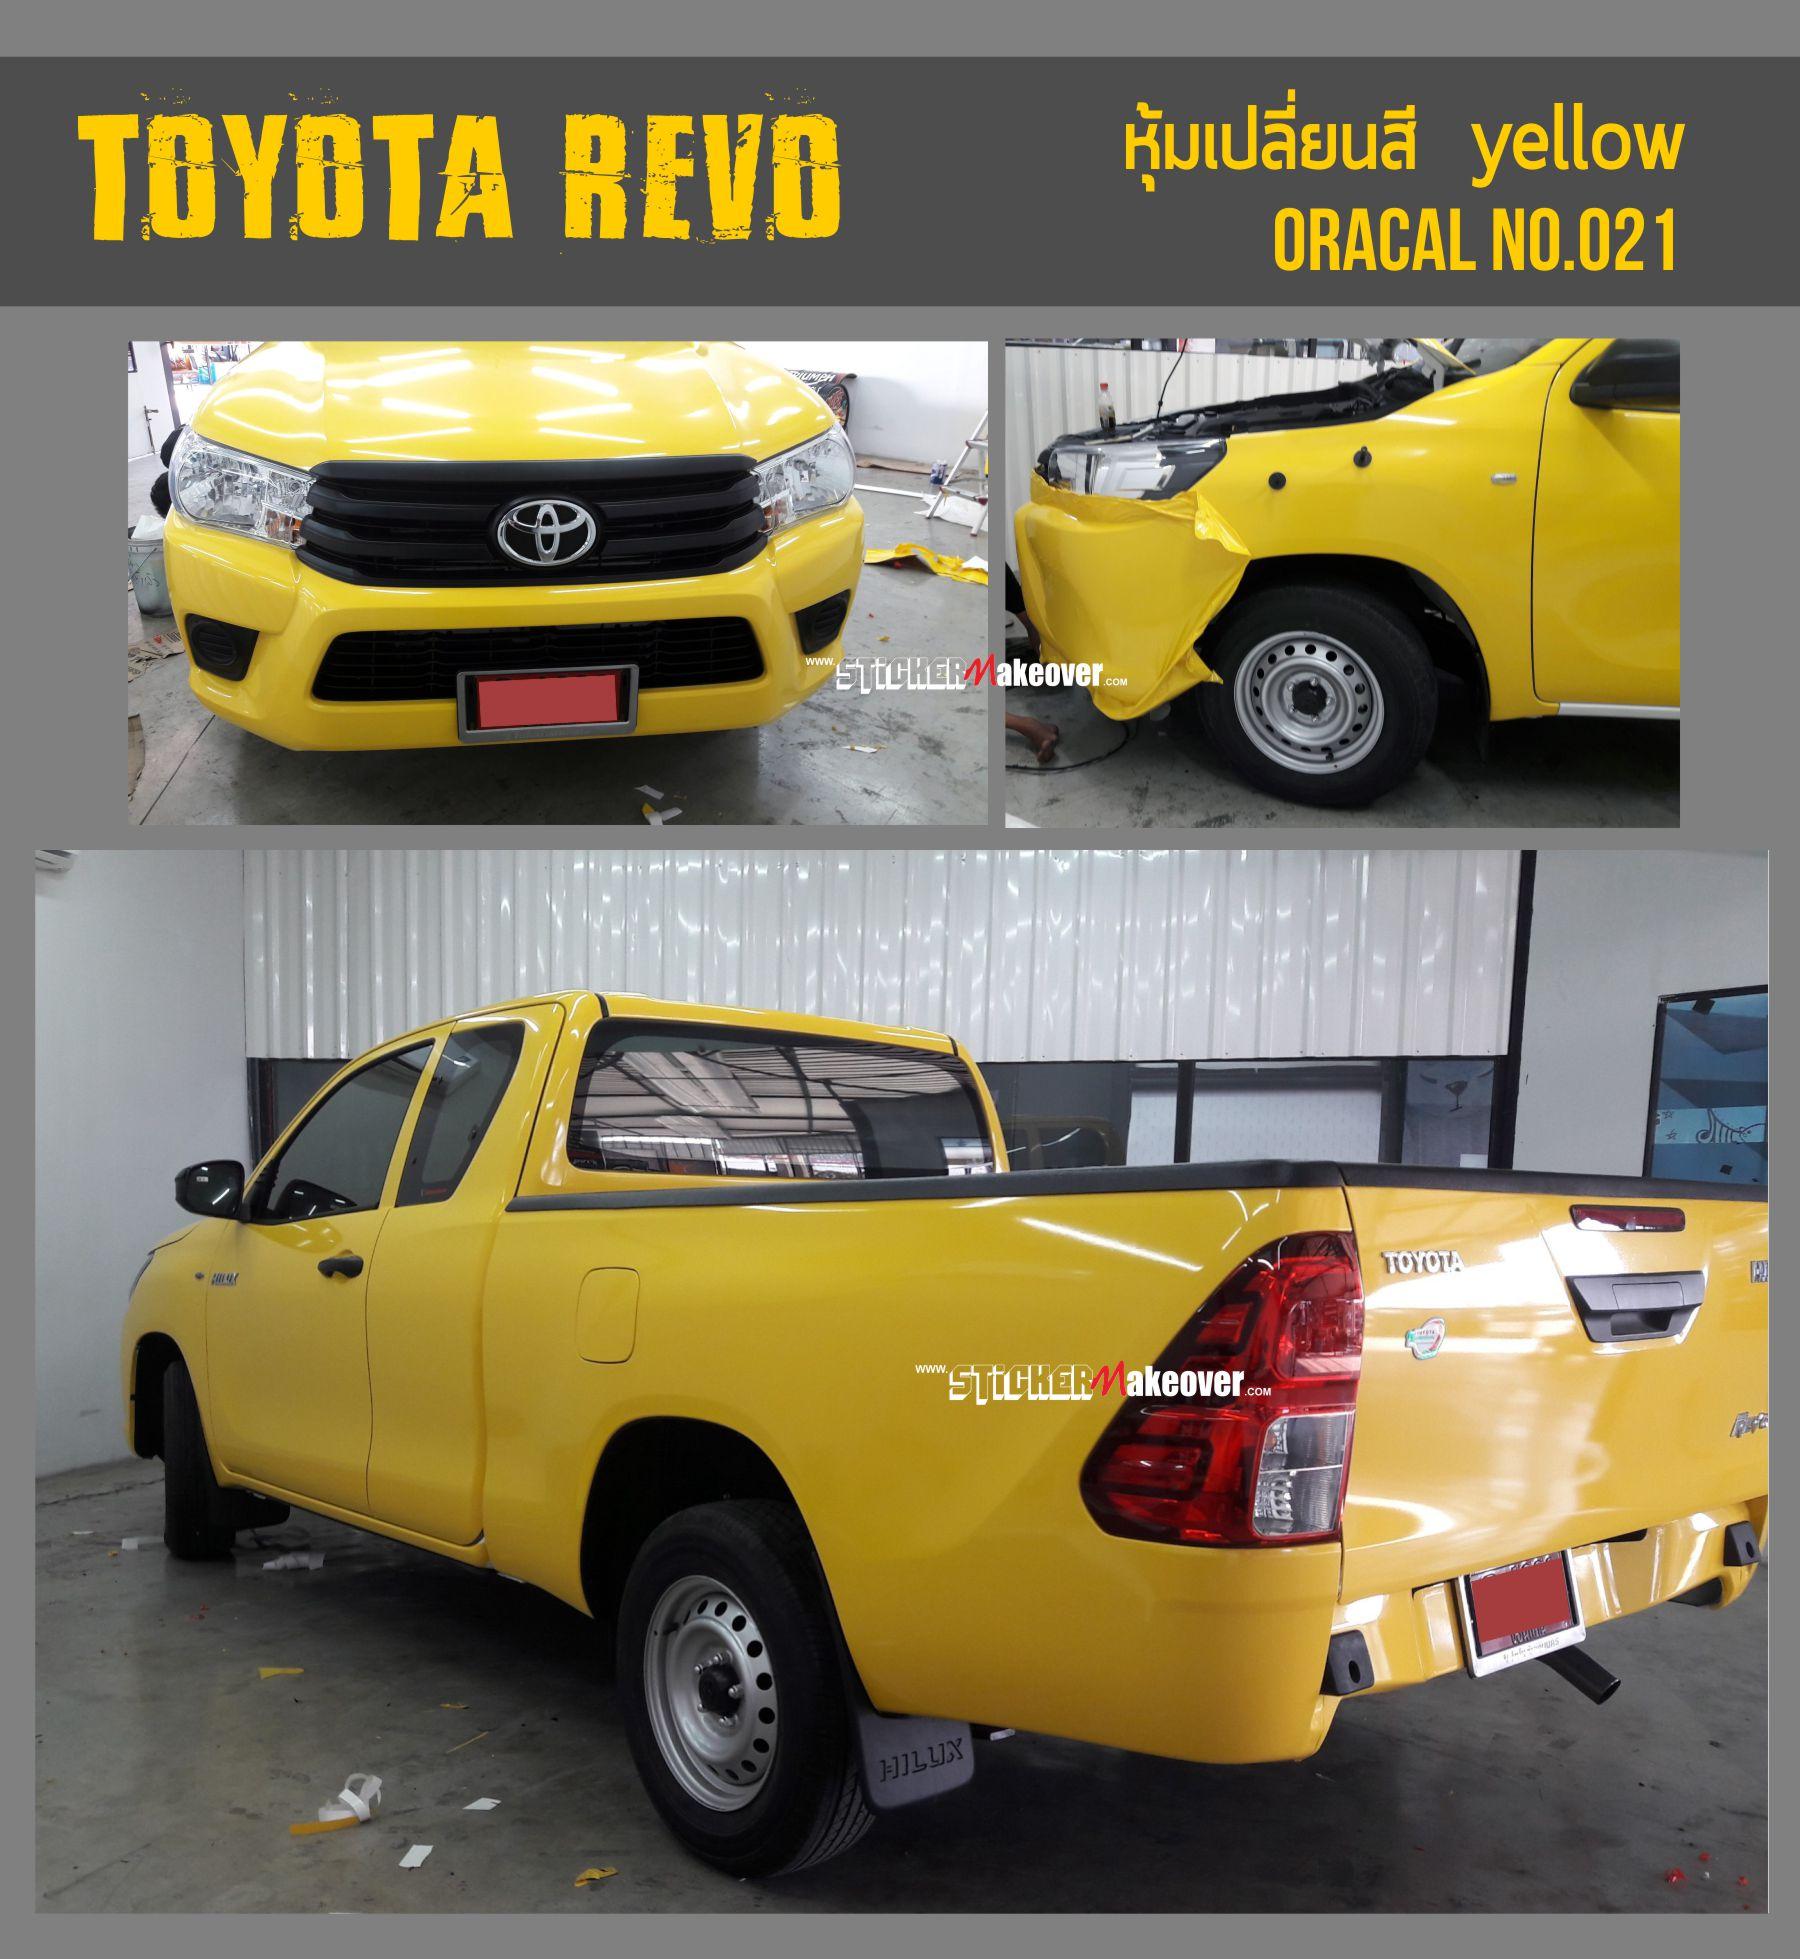 wrap car โตโยต้ารีโวสีเหลือง revoเเต่งสวย toyota revoเเต่ง หุ้มสติกเกอร์เปลี่ยนสีรถ ทำสีรถด้วยสติกเกอร์ ฟิล์มหุ้มเปลี่ยนสีรถ wrap ford ranger สีเหลือง เปลี่ยนสีรถทั้งคันด้วยสติกเกอร์ wrapเปลี่ยนสีรถ แรพสีรถ